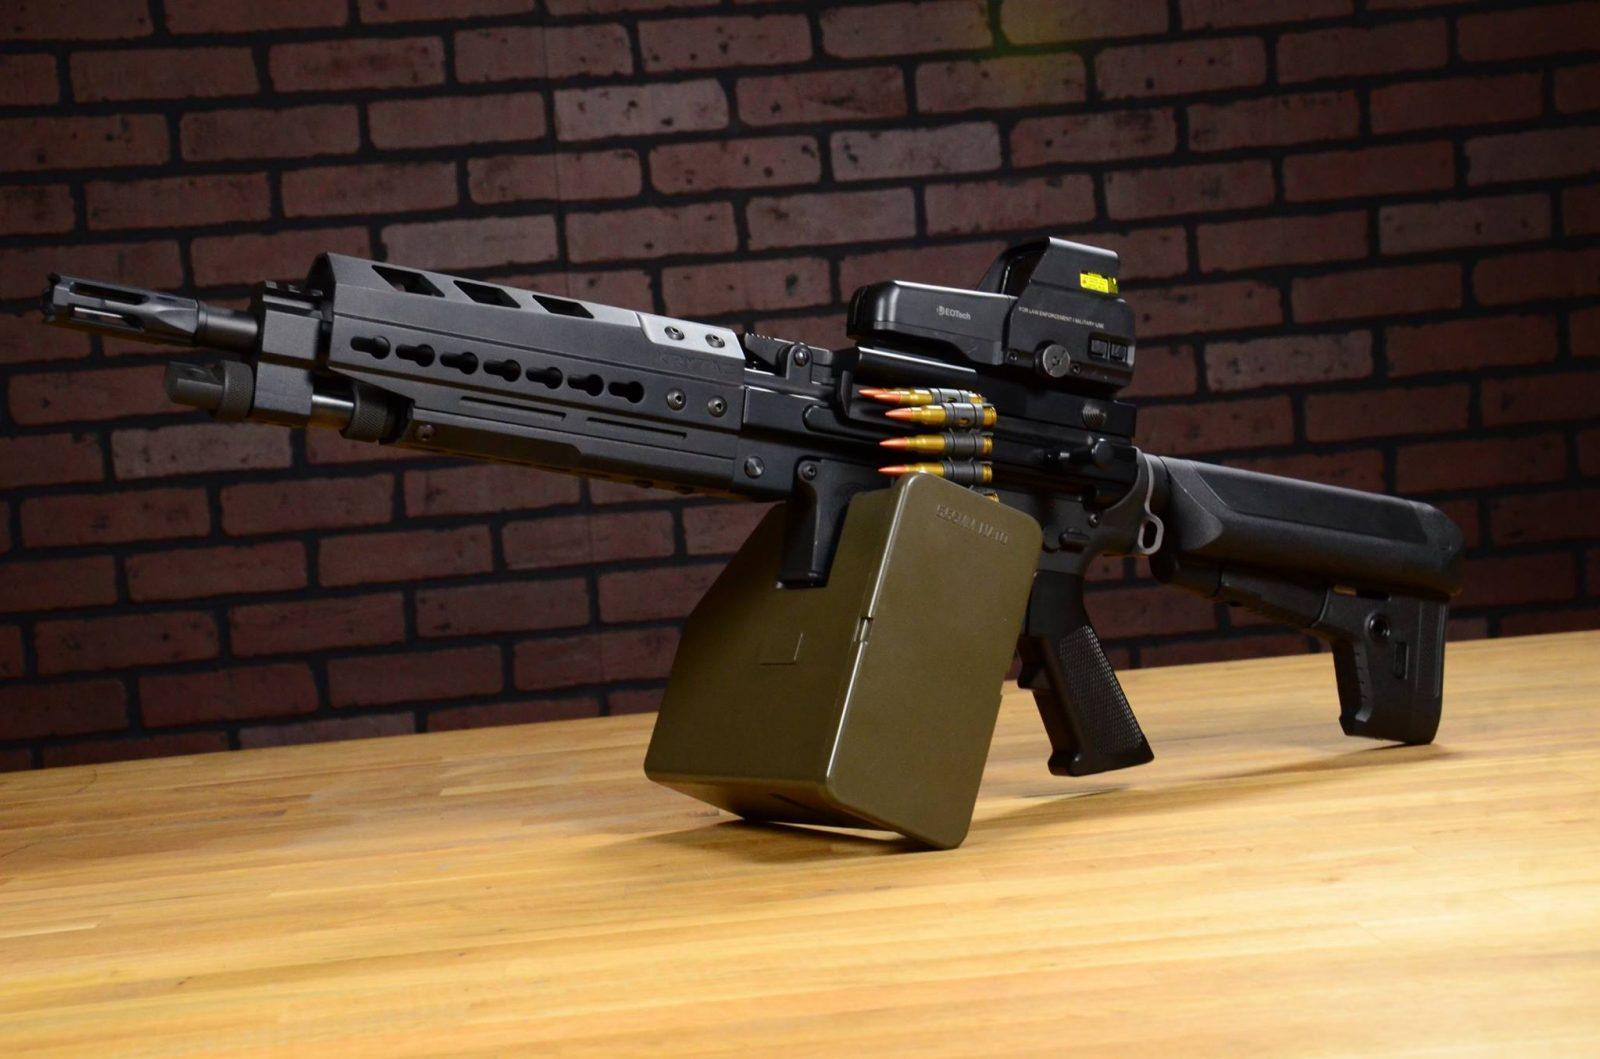 krytac-lmg-enhanced-airsoft-rifle-promo-image